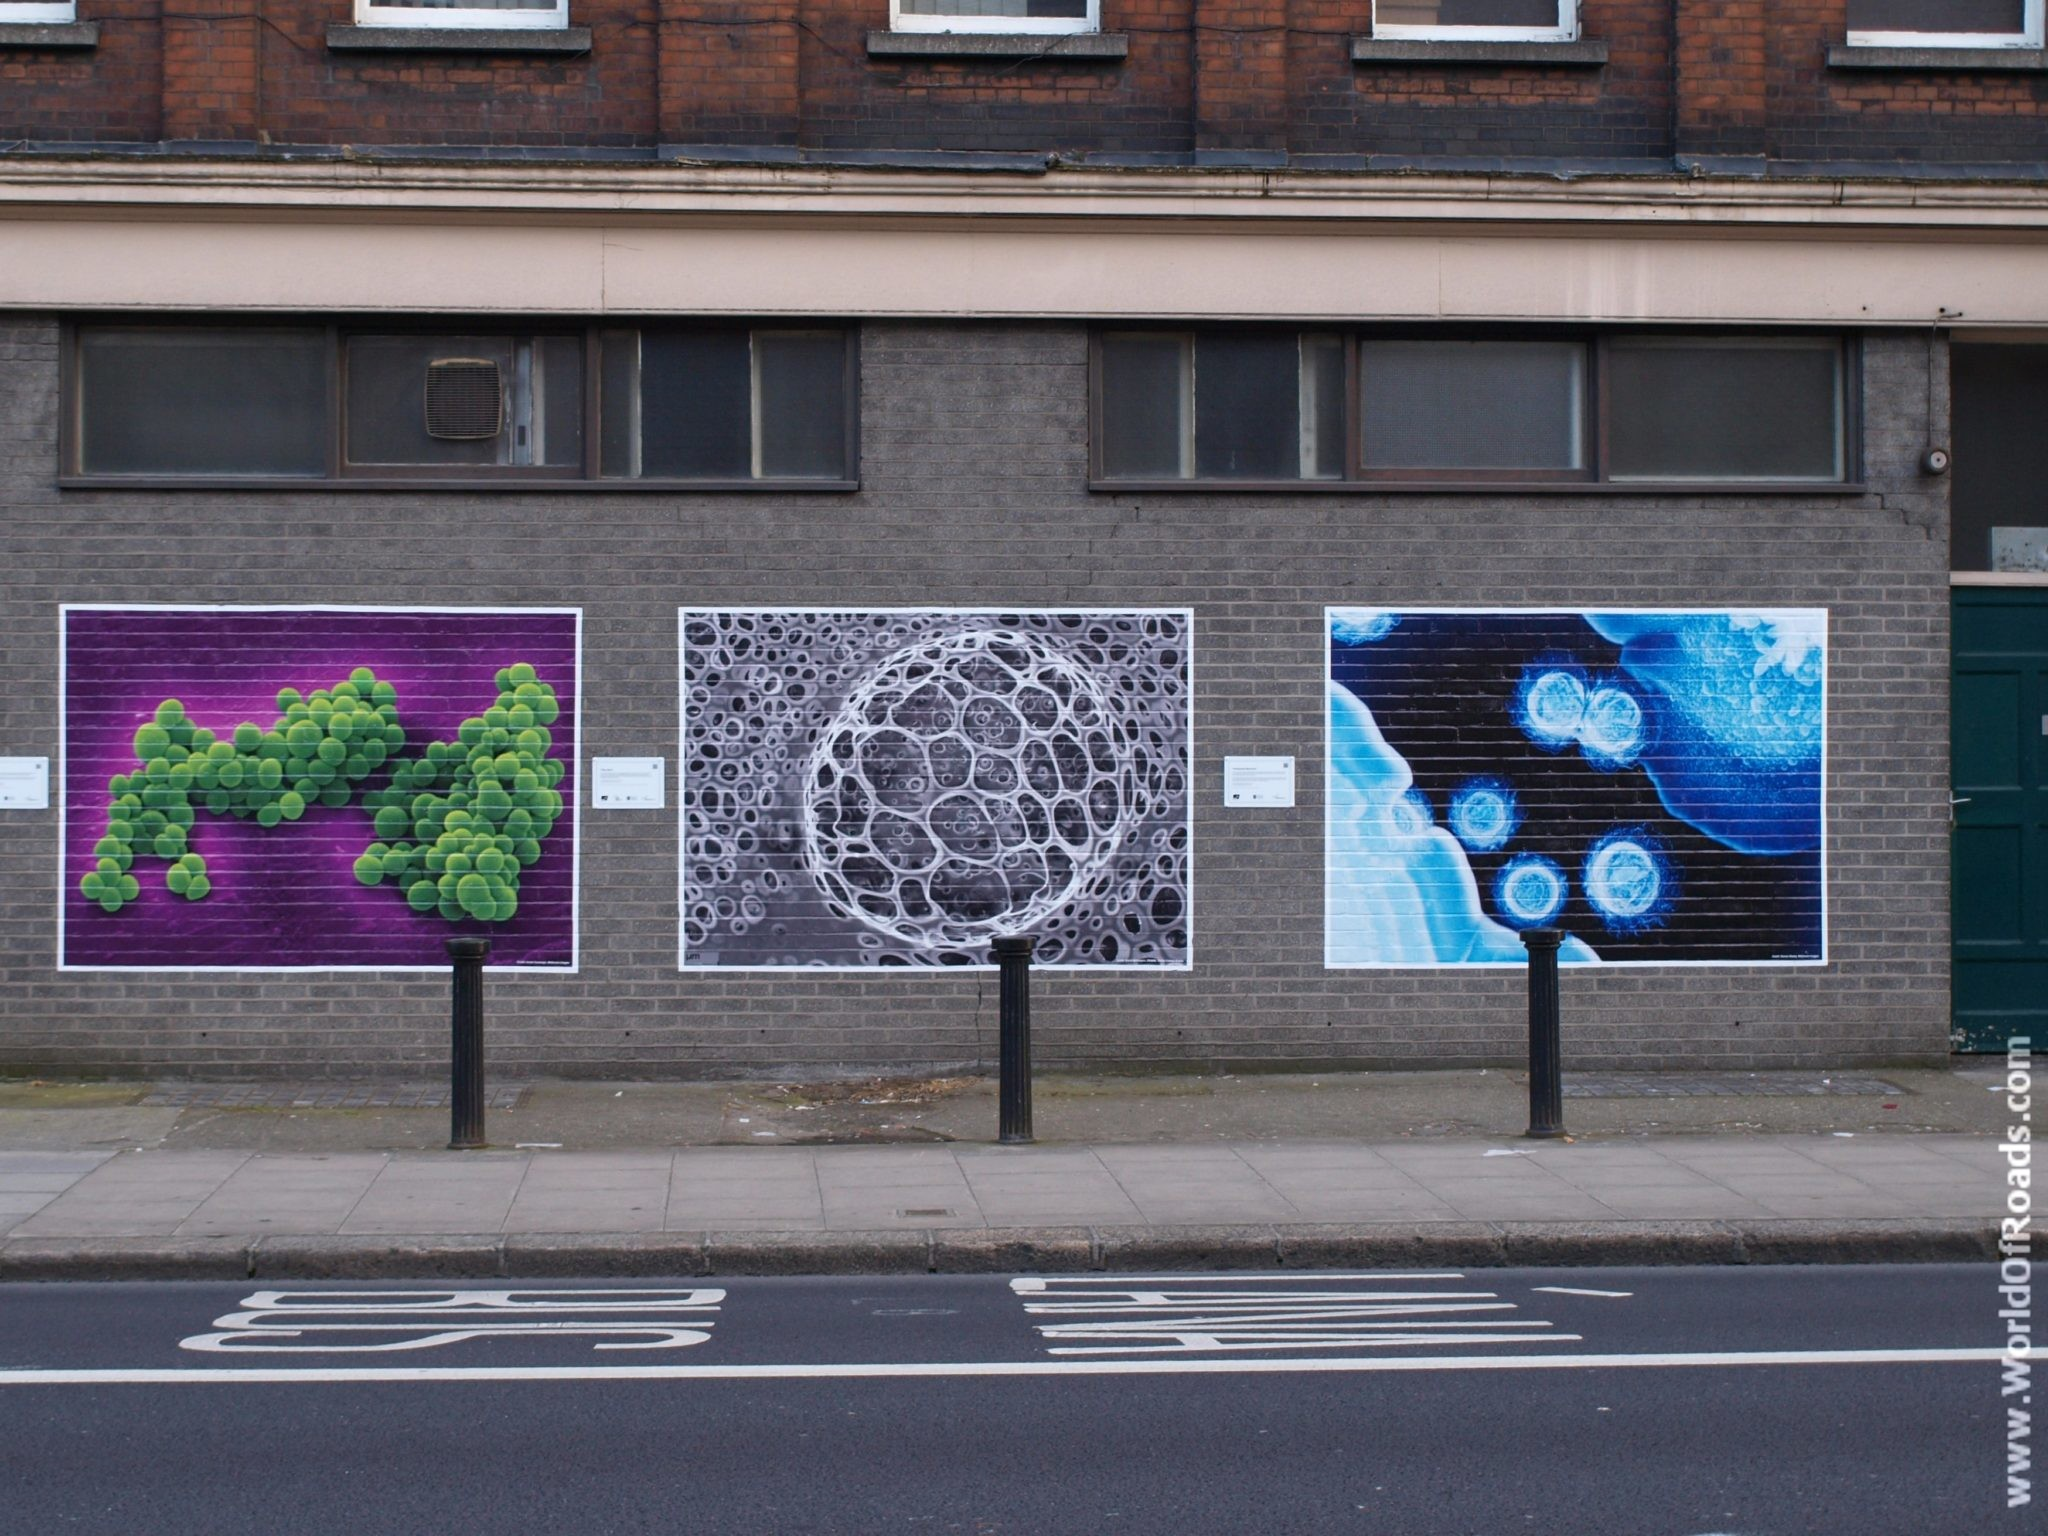 Уличное граффити. Дублин. Ирландия.